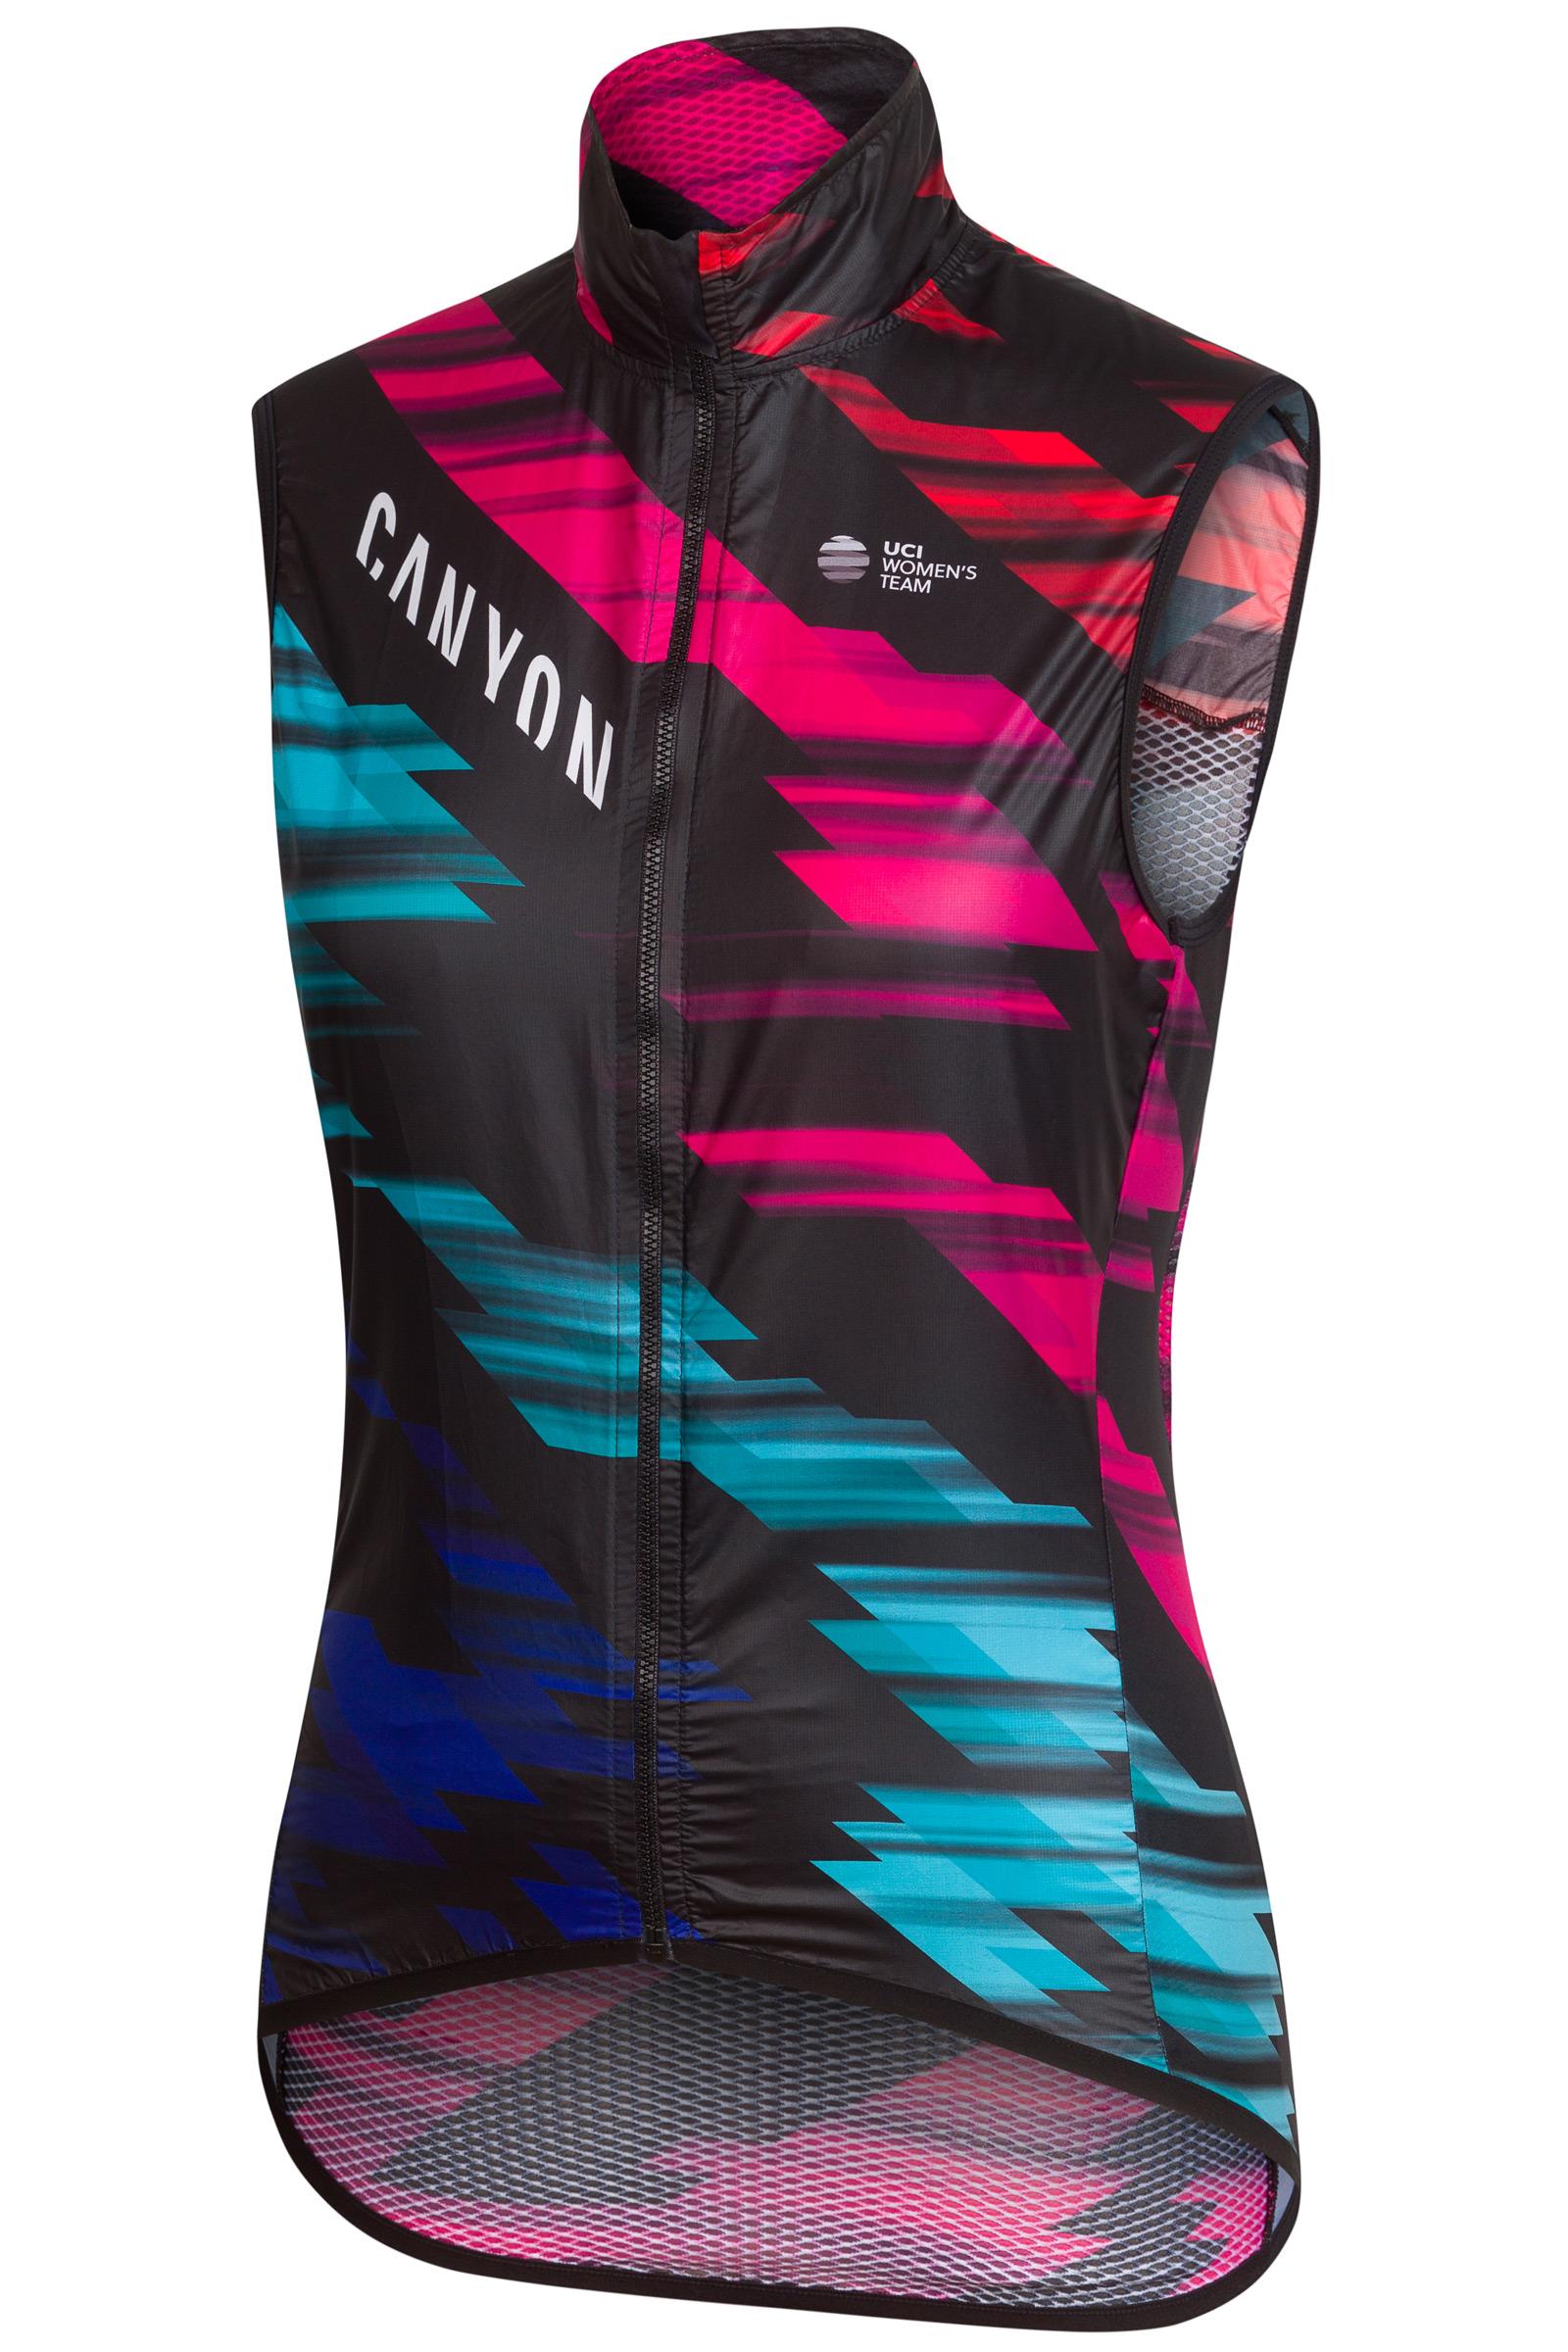 Rapha dishes out premium women s pro Canyon  SRAM replica kit ... 78d83c515